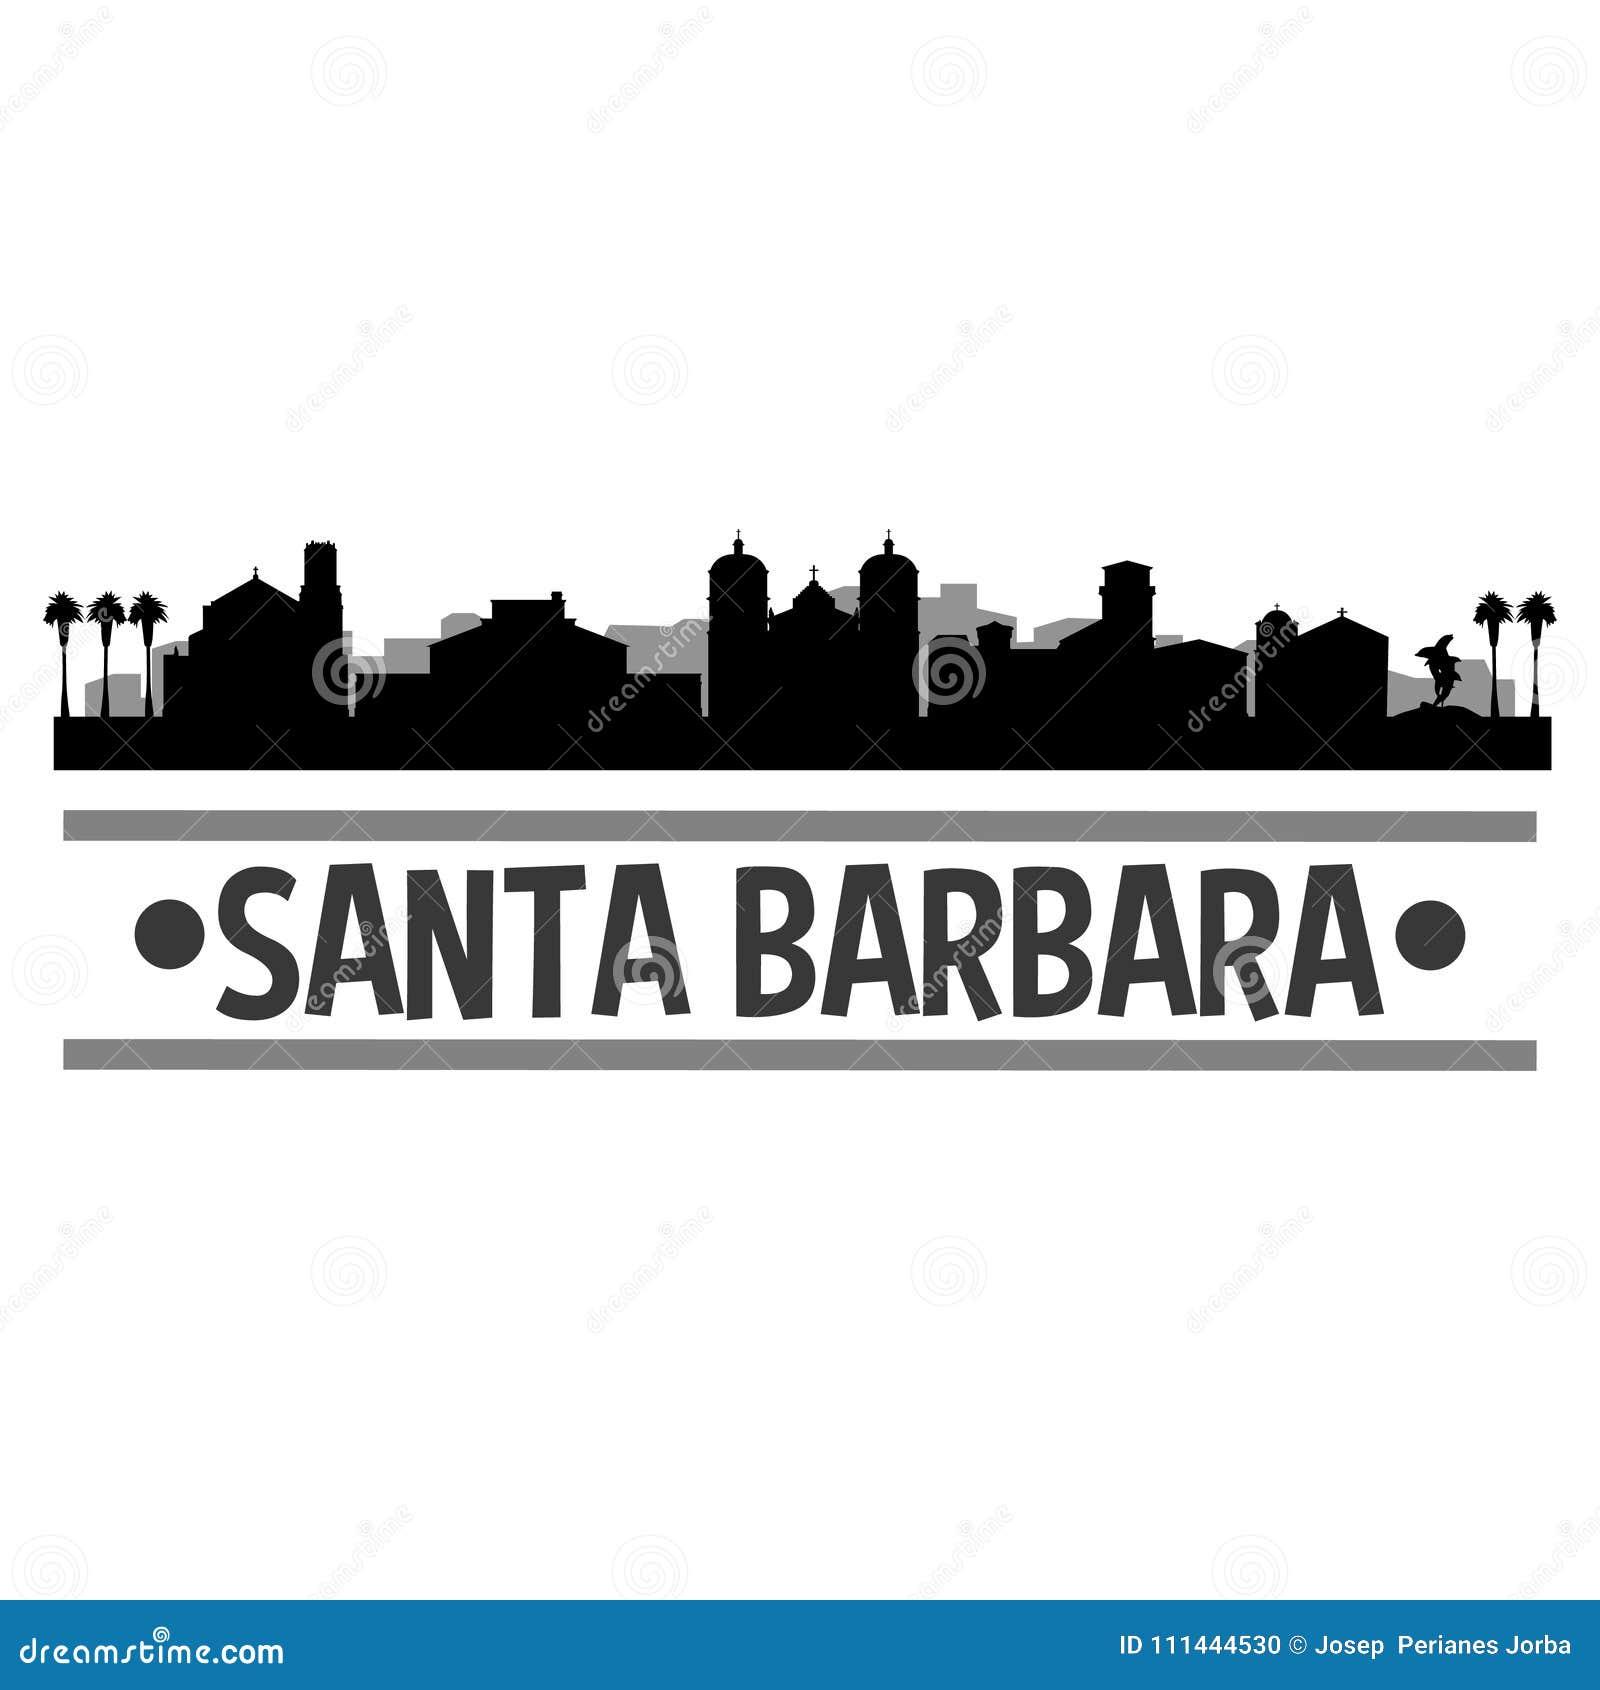 Santa Barbara California Icon Vector Art Design Skyline Flat City